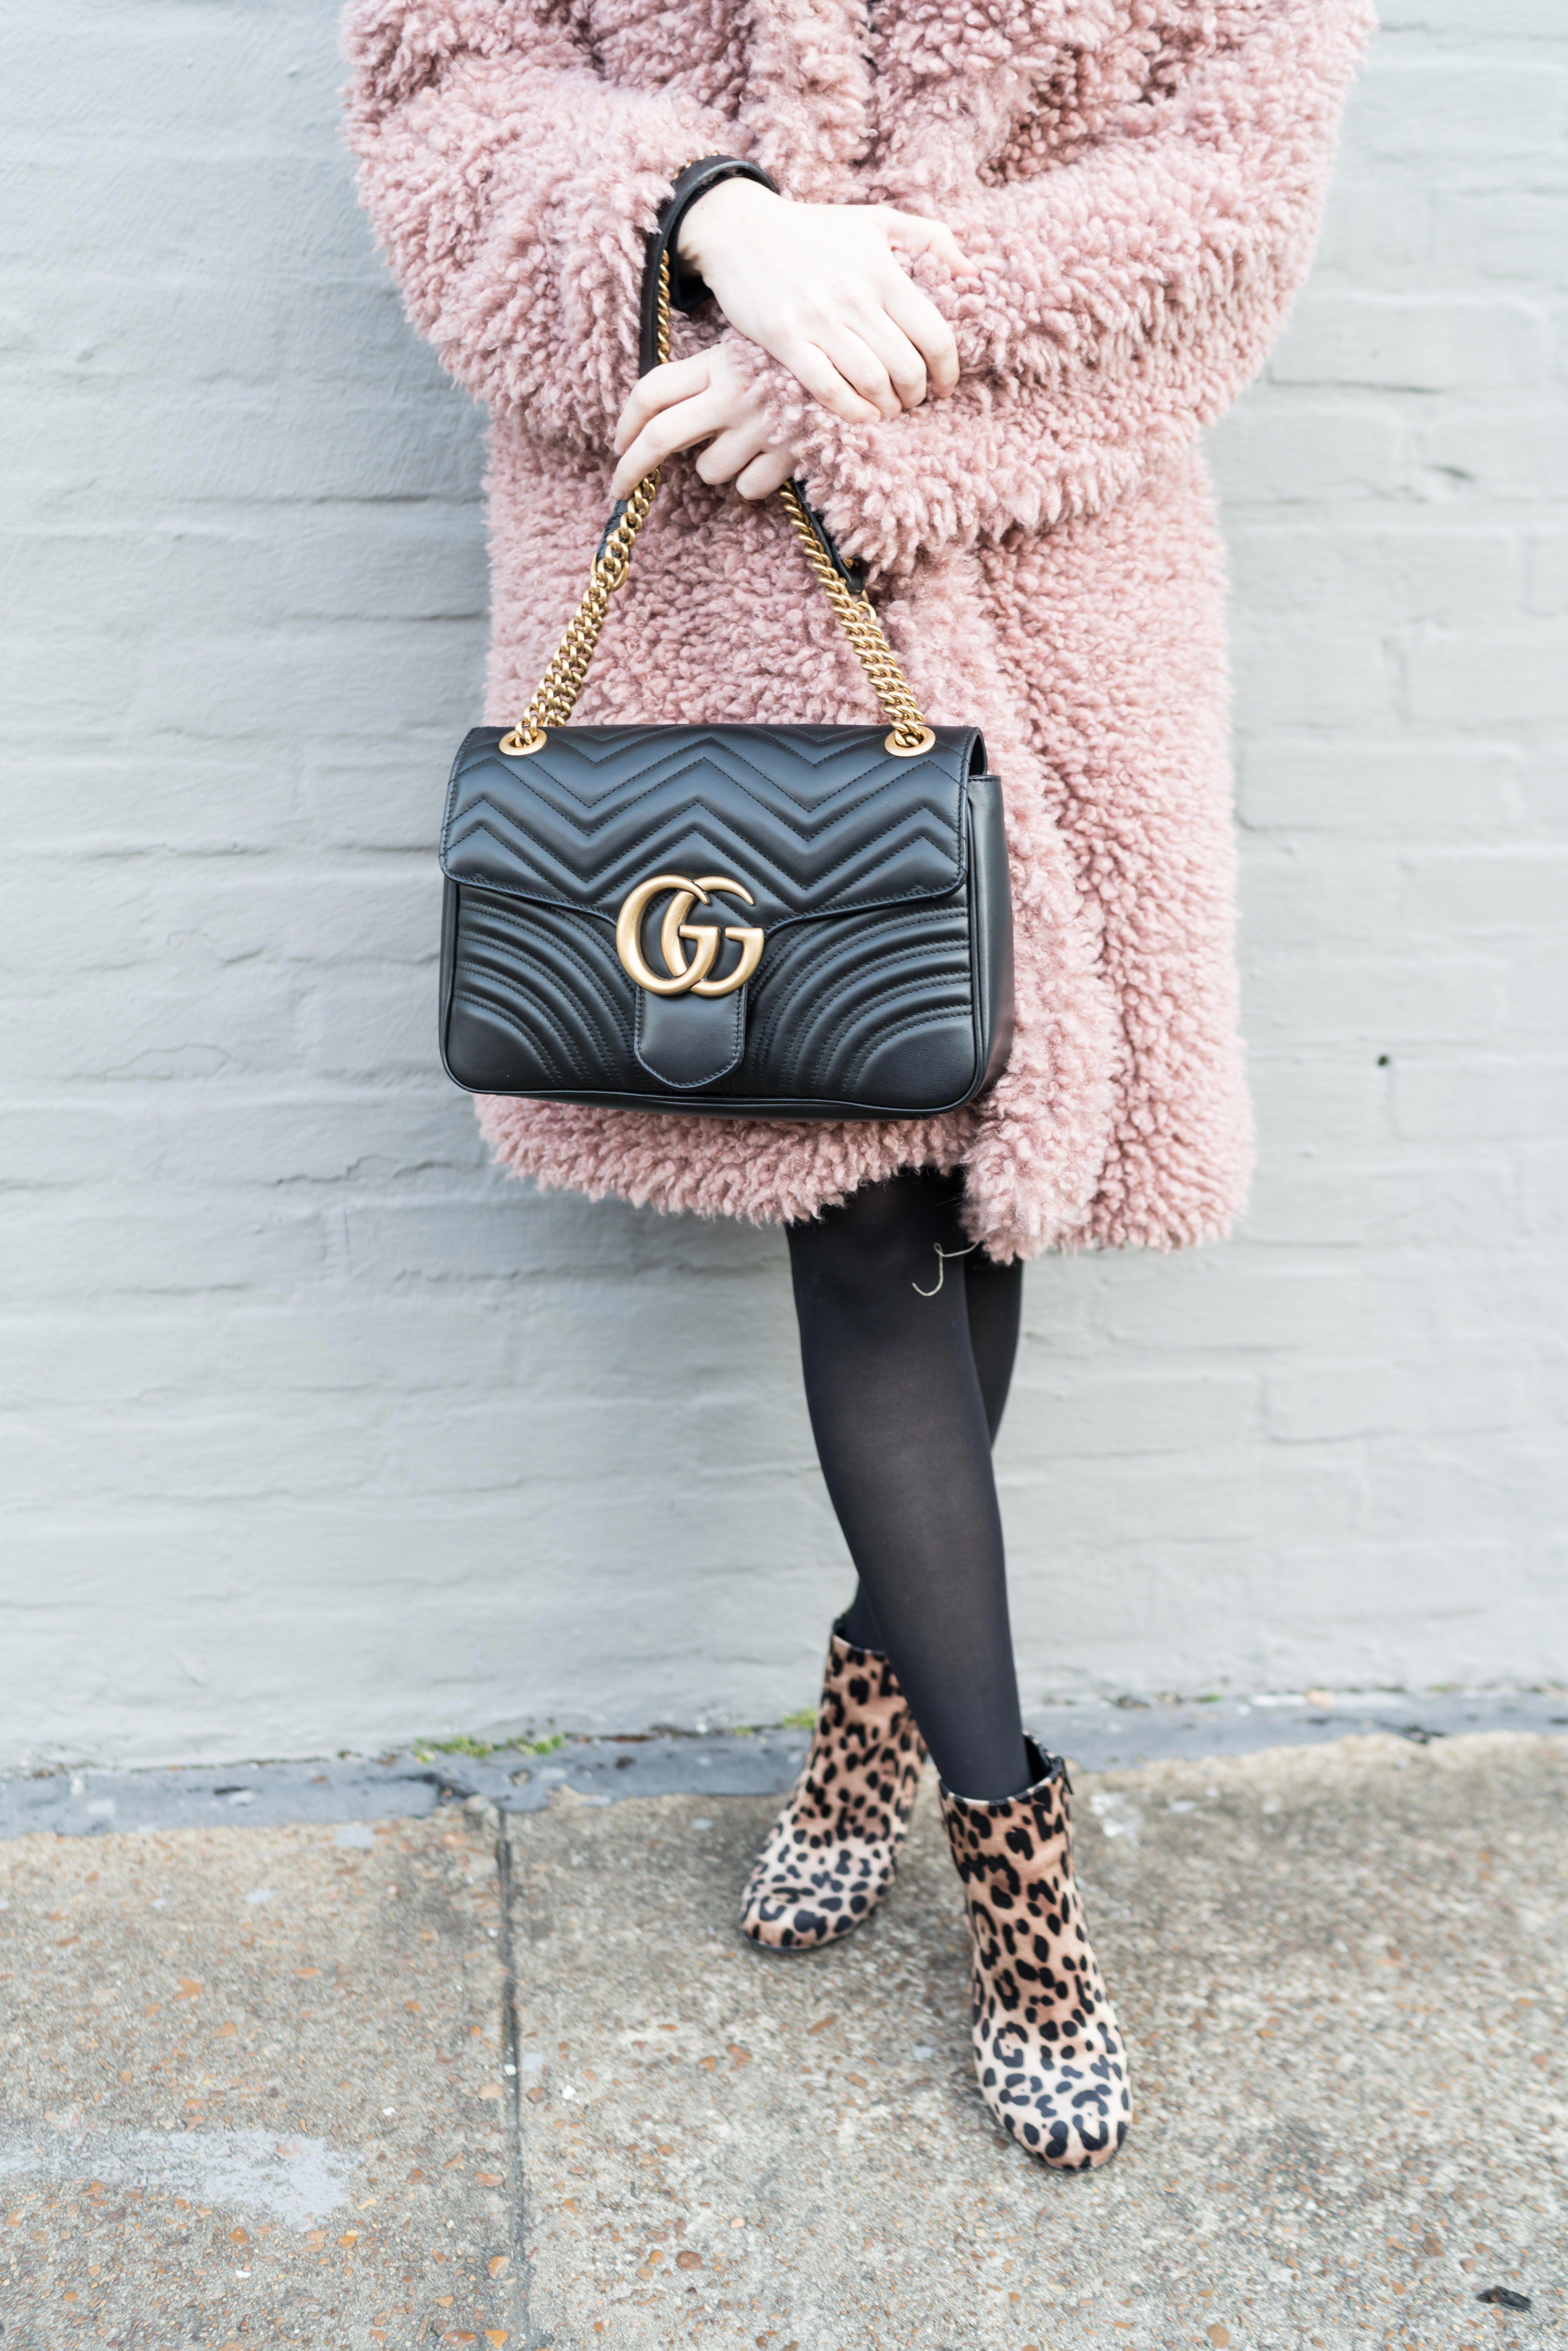 5150eb8c StockX Bags - Easy Way to Save on Luxury Handbags - Pretty in Pink Megan  #Guccihandbags